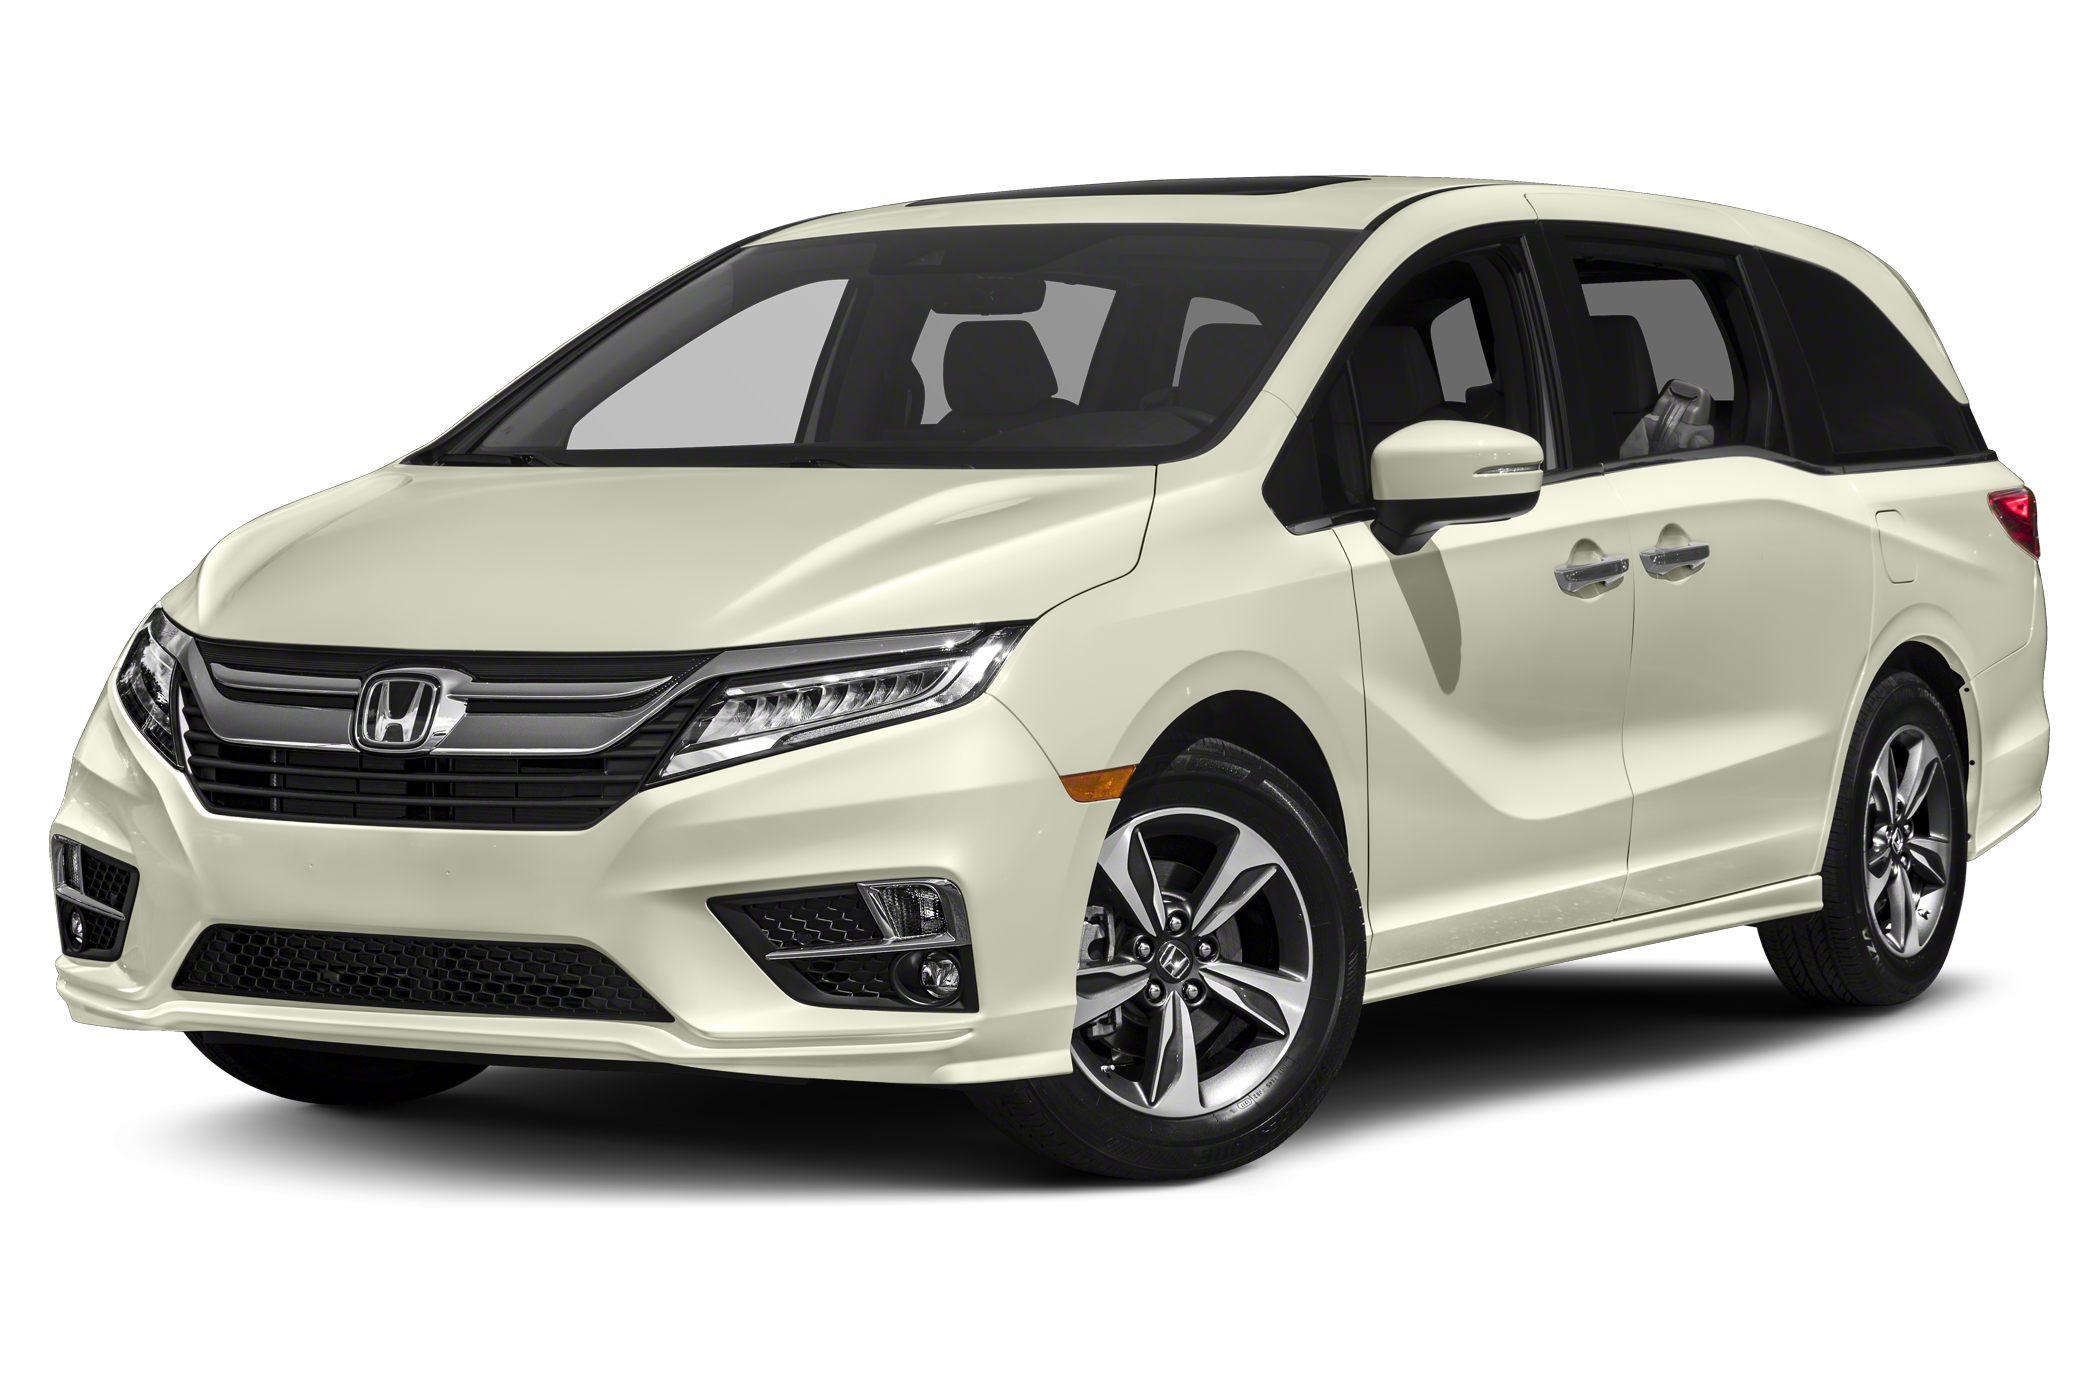 2018 Honda Odyssey Photos